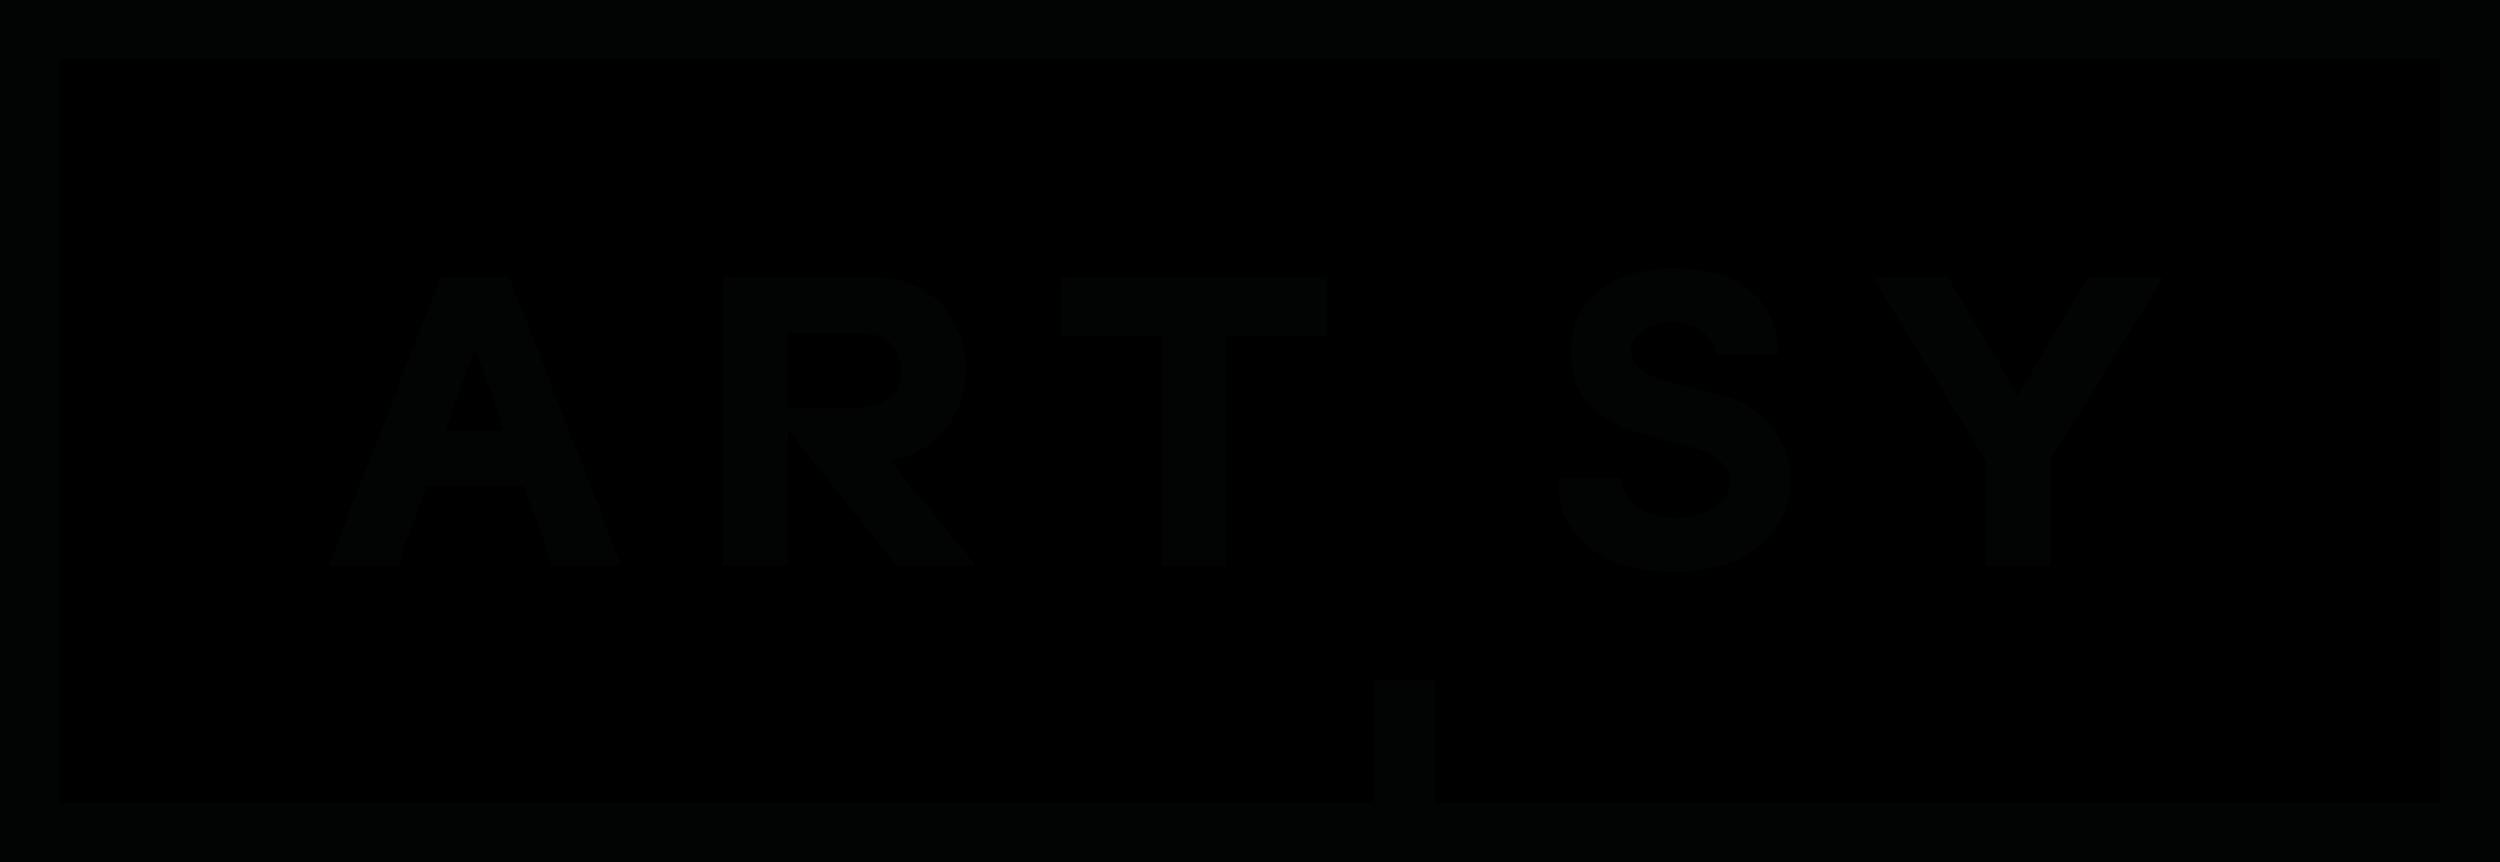 artsy-logo.png